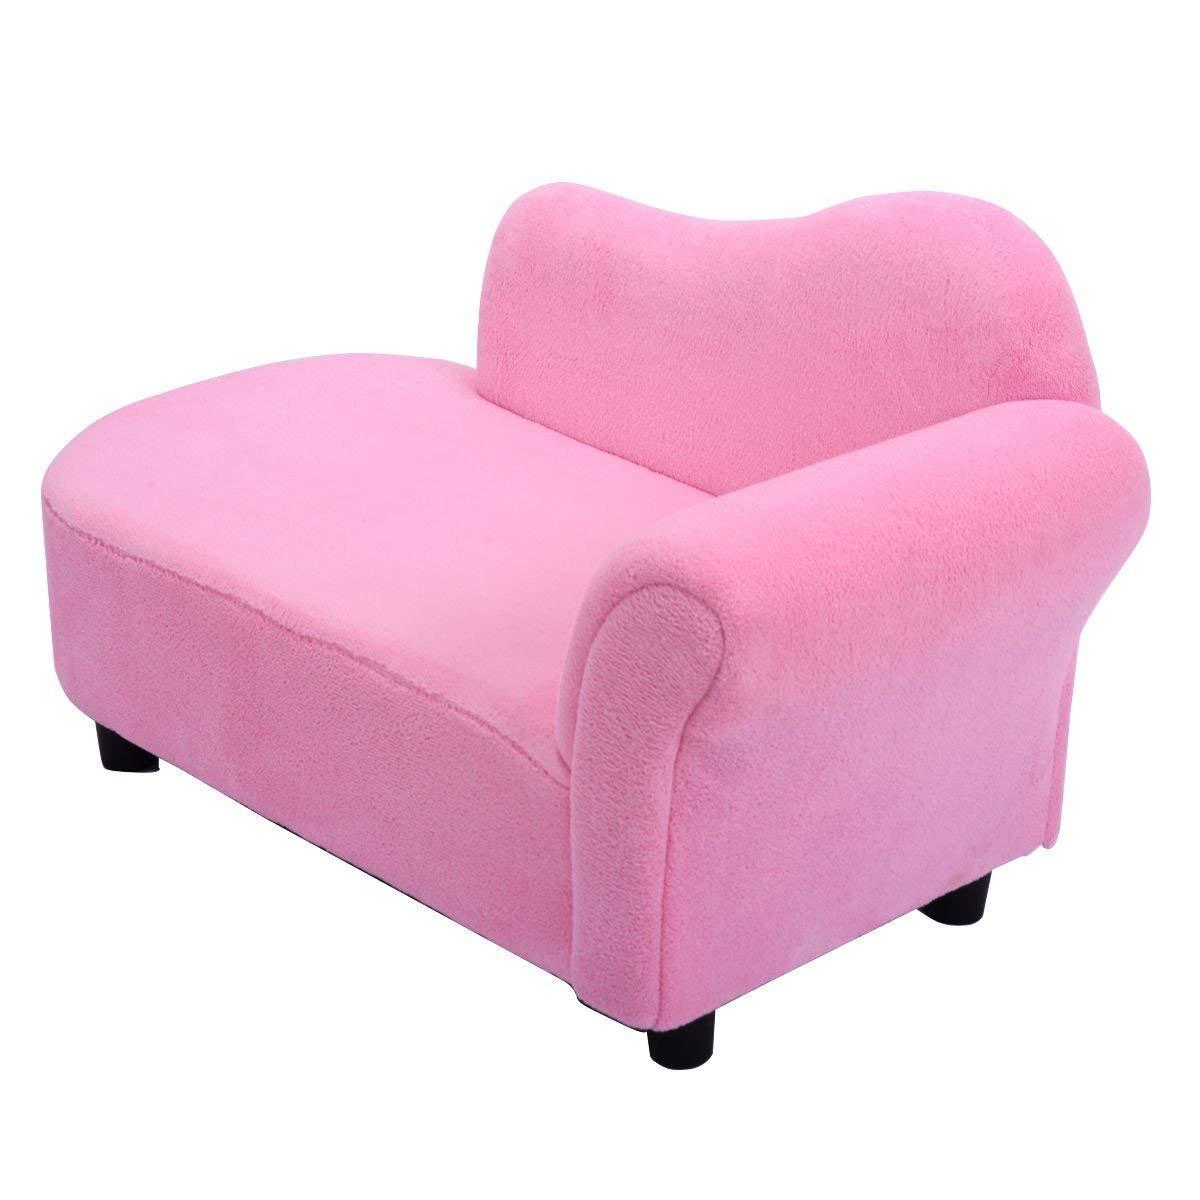 Fabulous Buy Children39S Furniture Children39S Sofa Small Sofa Evergreenethics Interior Chair Design Evergreenethicsorg